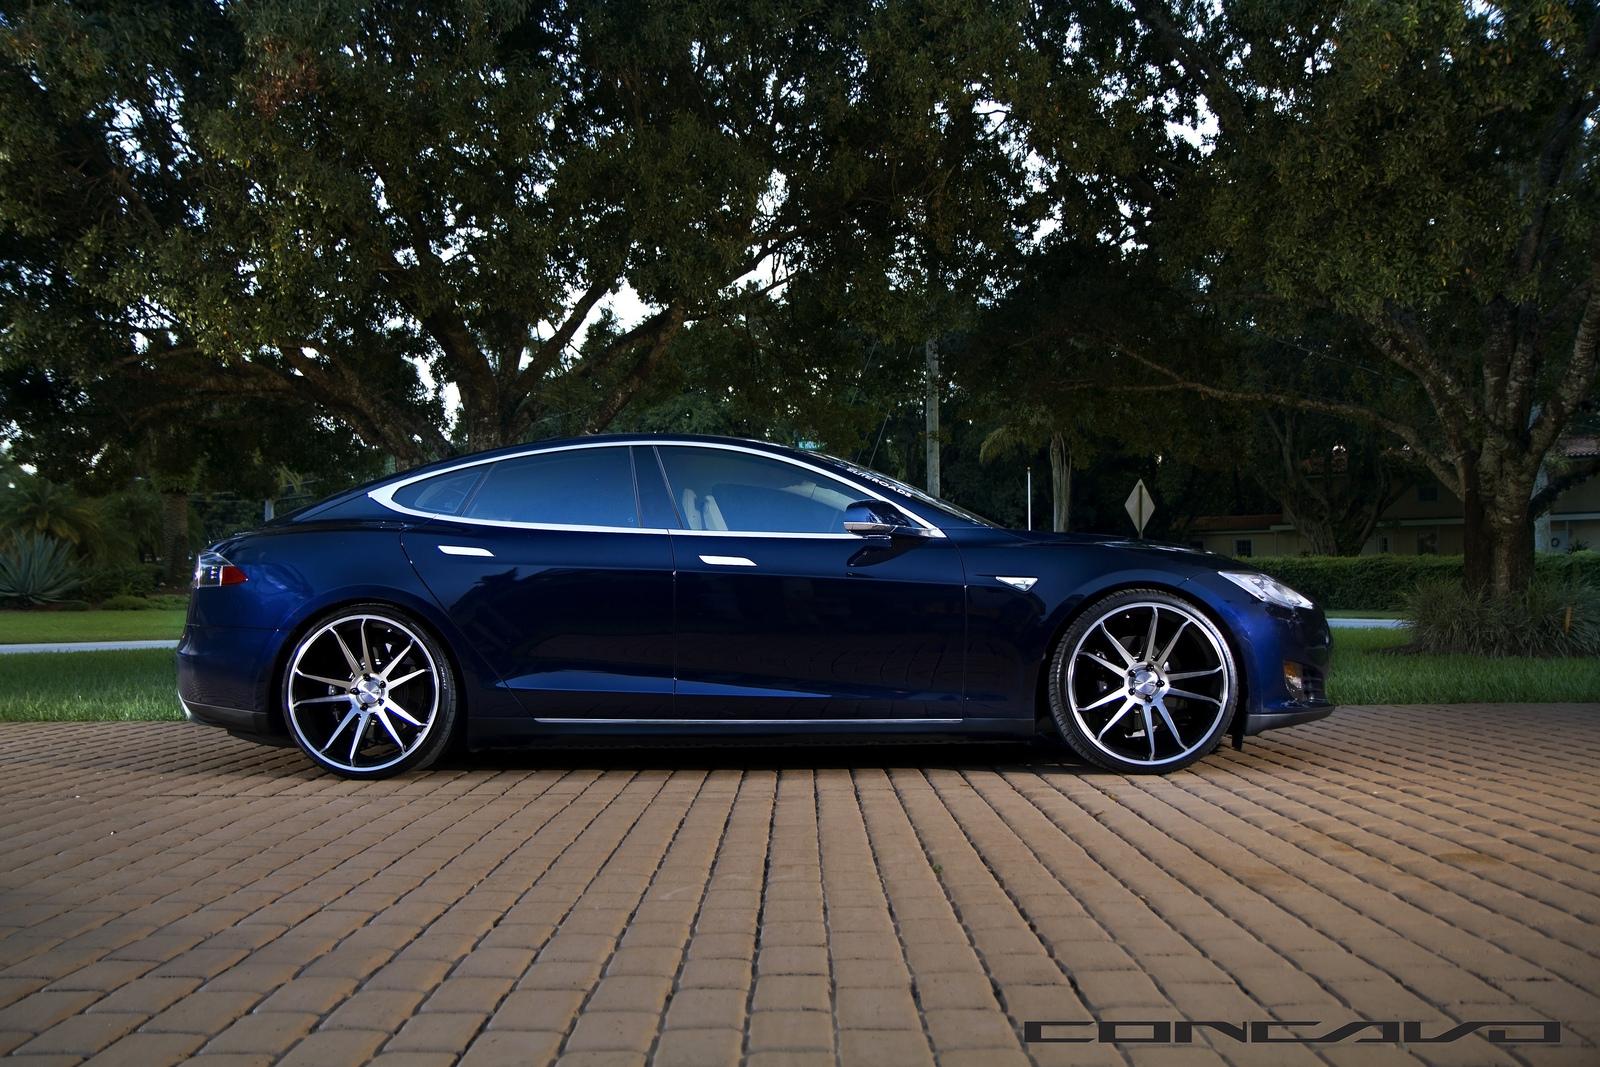 Tesla-Model-S-Concavo-22inch-Wheels-Side